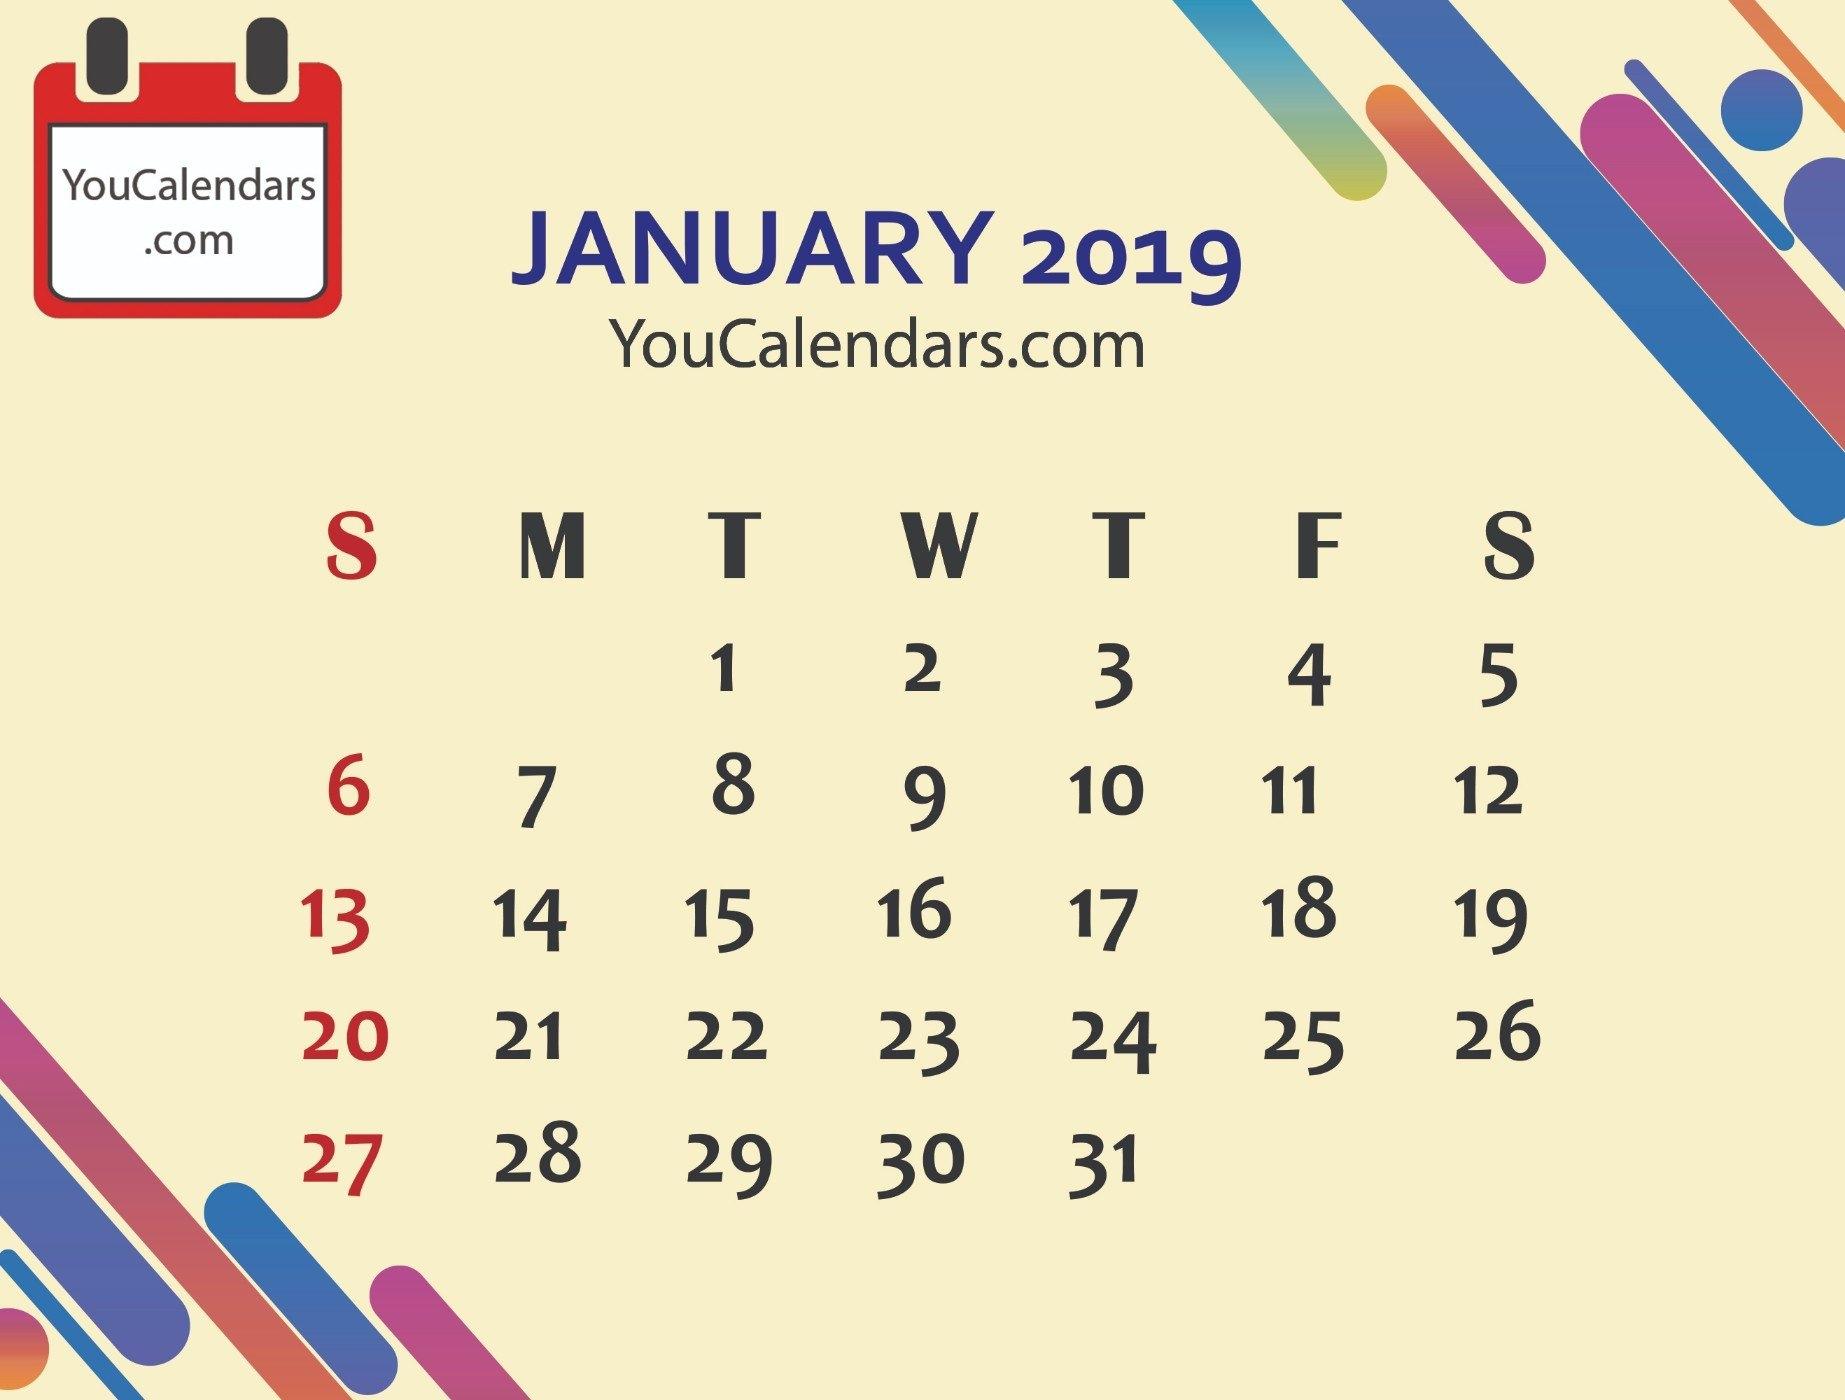 Free January 2019 Calendar Printable Template - You Calendars W 2019 Calendar